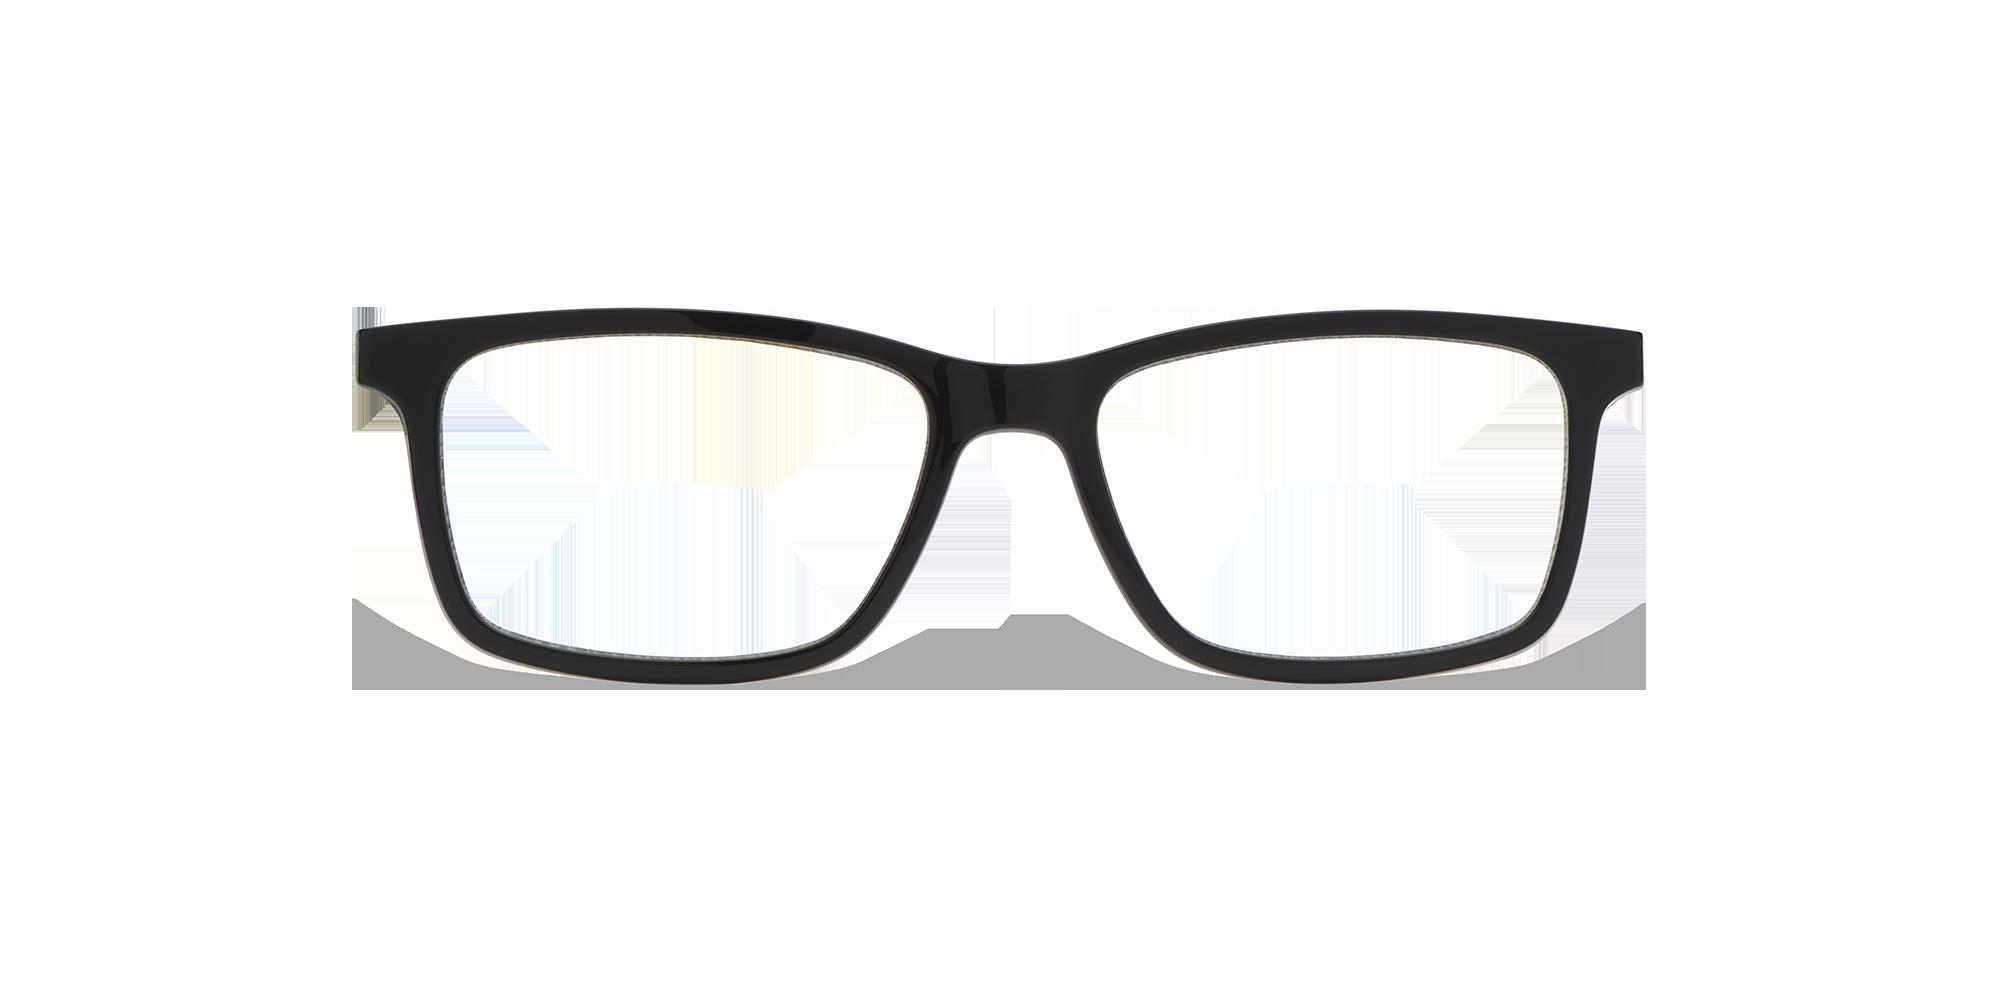 afflelou/france/products/smart_clip/clips_glasses/TMK32BBBK015316.png